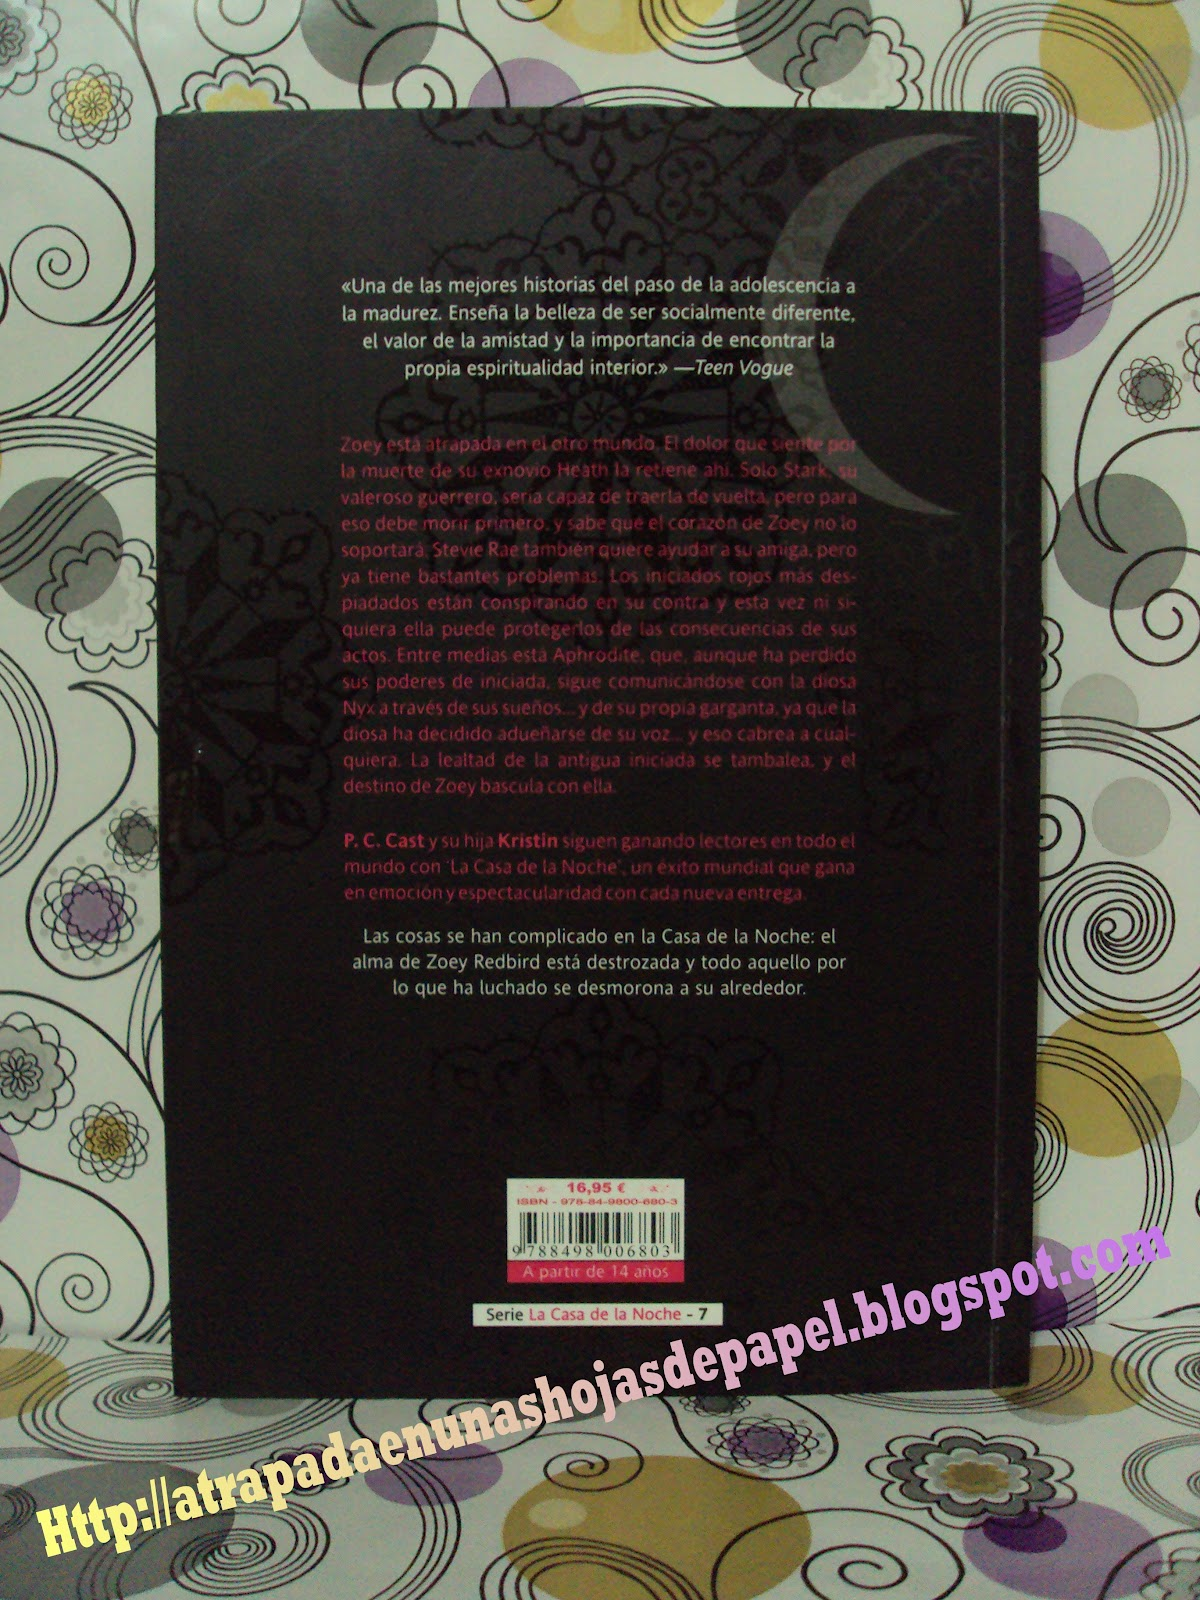 http://1.bp.blogspot.com/-M2wuTVcvrKc/T3eVP4bB_gI/AAAAAAAABe0/_JJCtytvxWI/s1600/Abrasada+La+casa+de+la+noche+P.C.+Cast+y+Kristin+Cast+portada+trasera+Atrapada+en+unas+hojas+de+papel.JPG